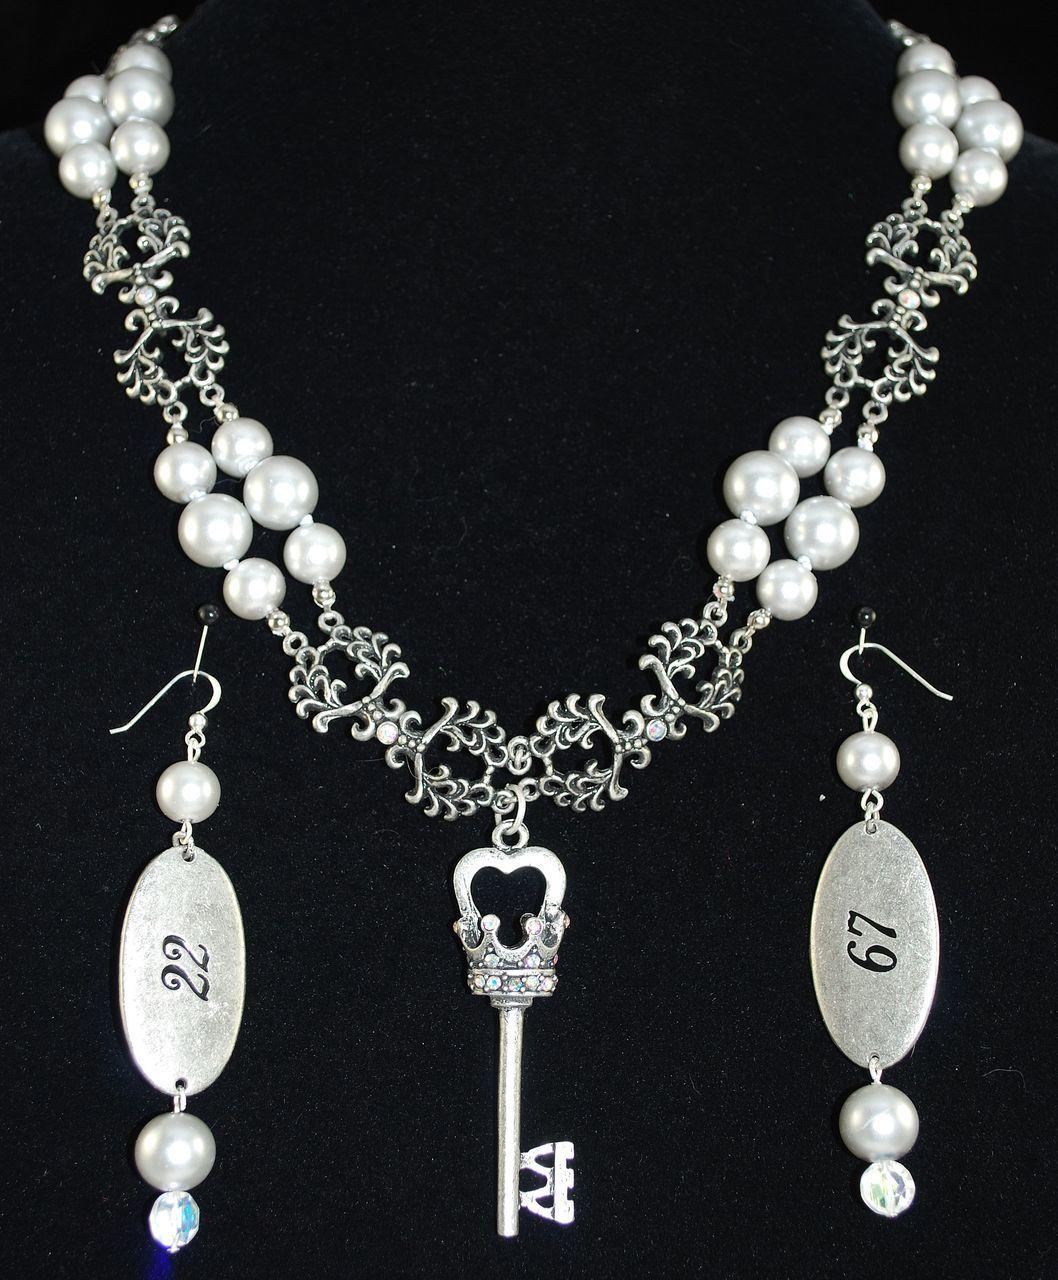 Enchanting Jewelry Creations image 49